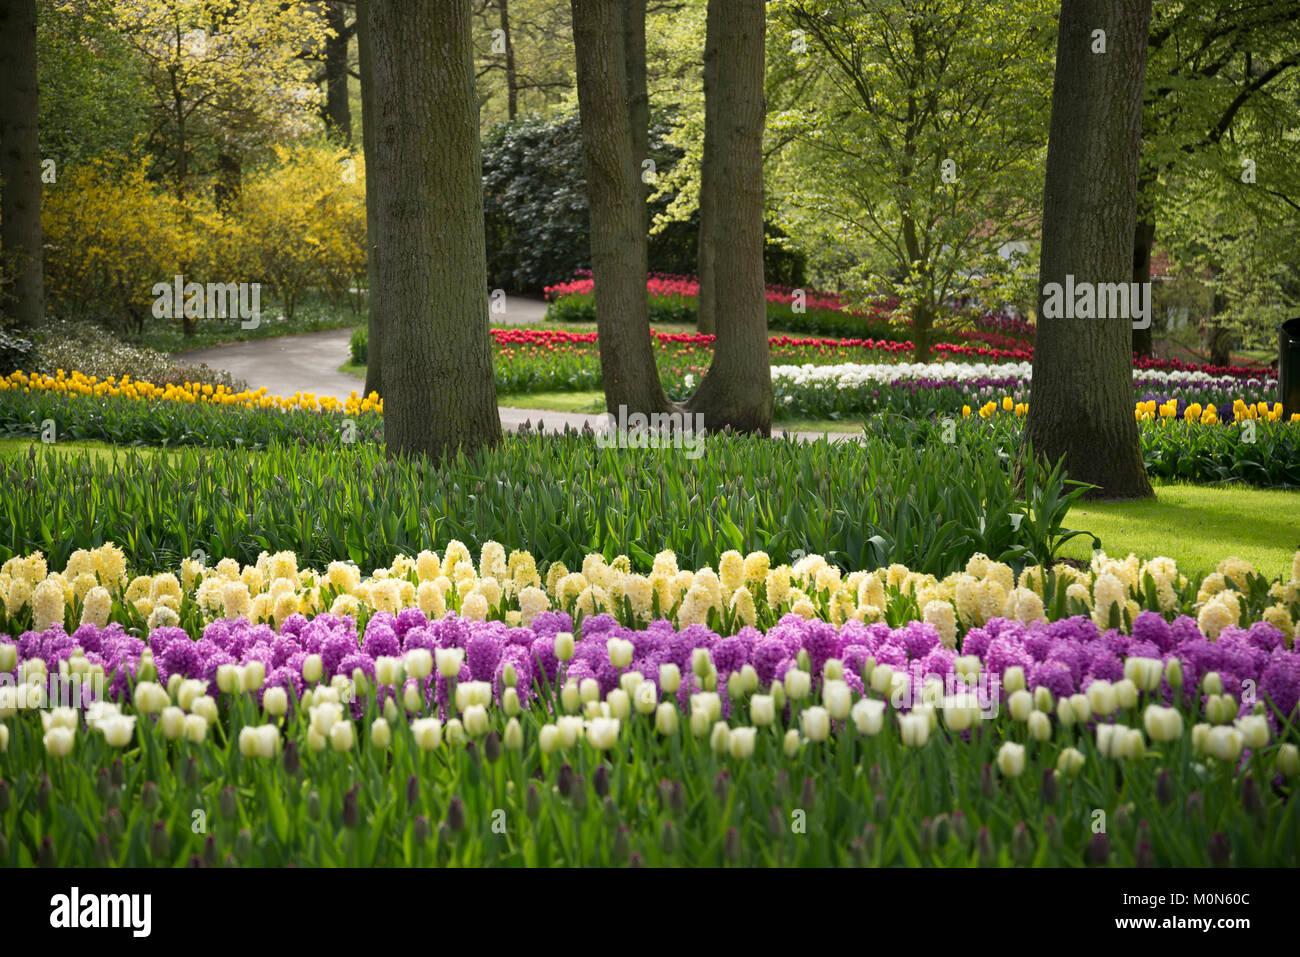 Tulpenbeete im Keukenhof Niederlande - Keukenhof Netherlands - Stock Image